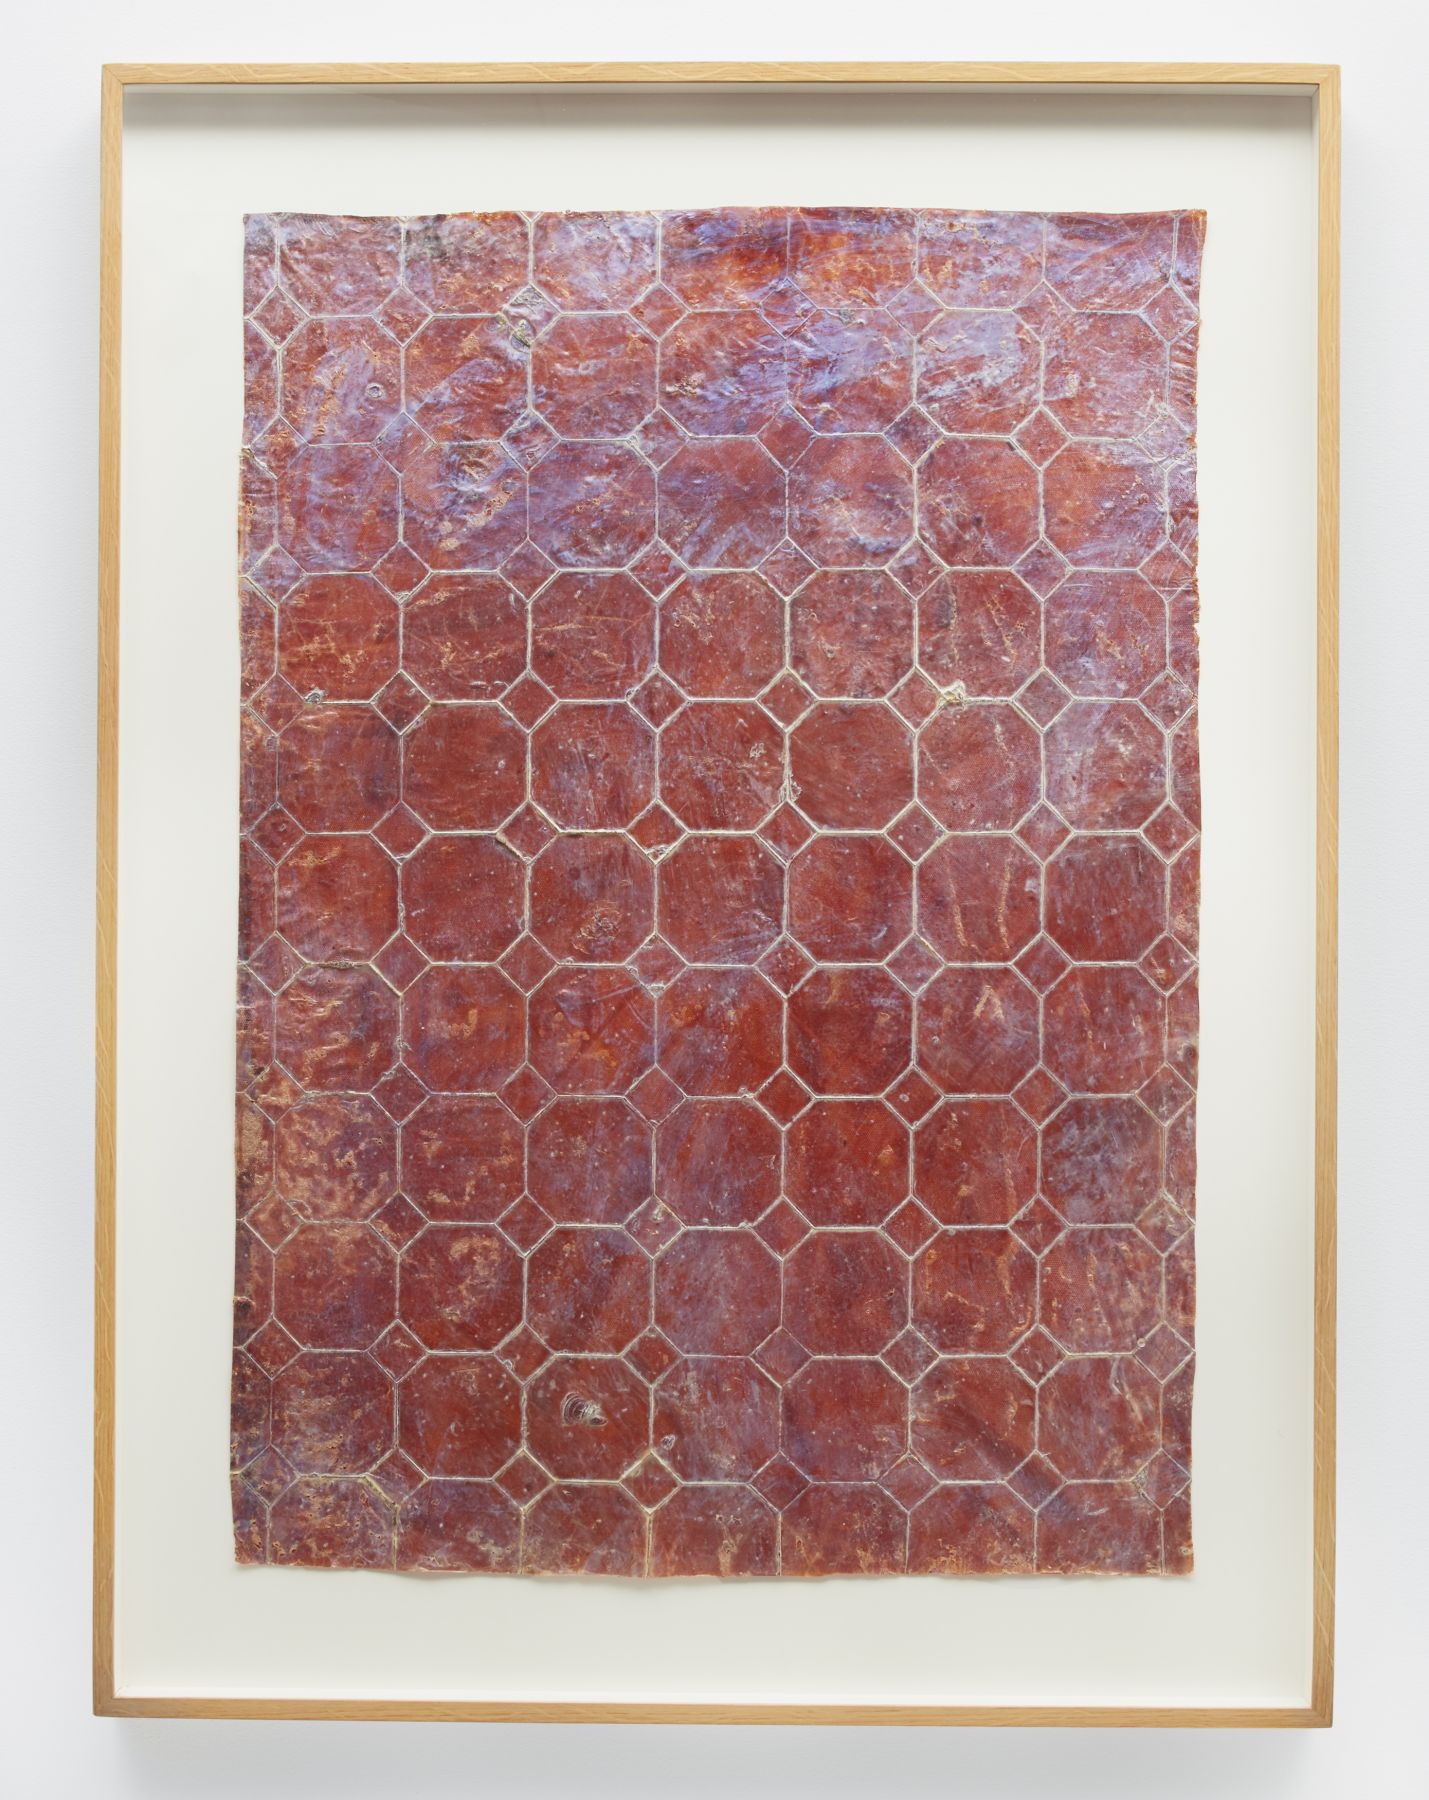 HEIDI BUCHER, Untitled (Borg), 1975